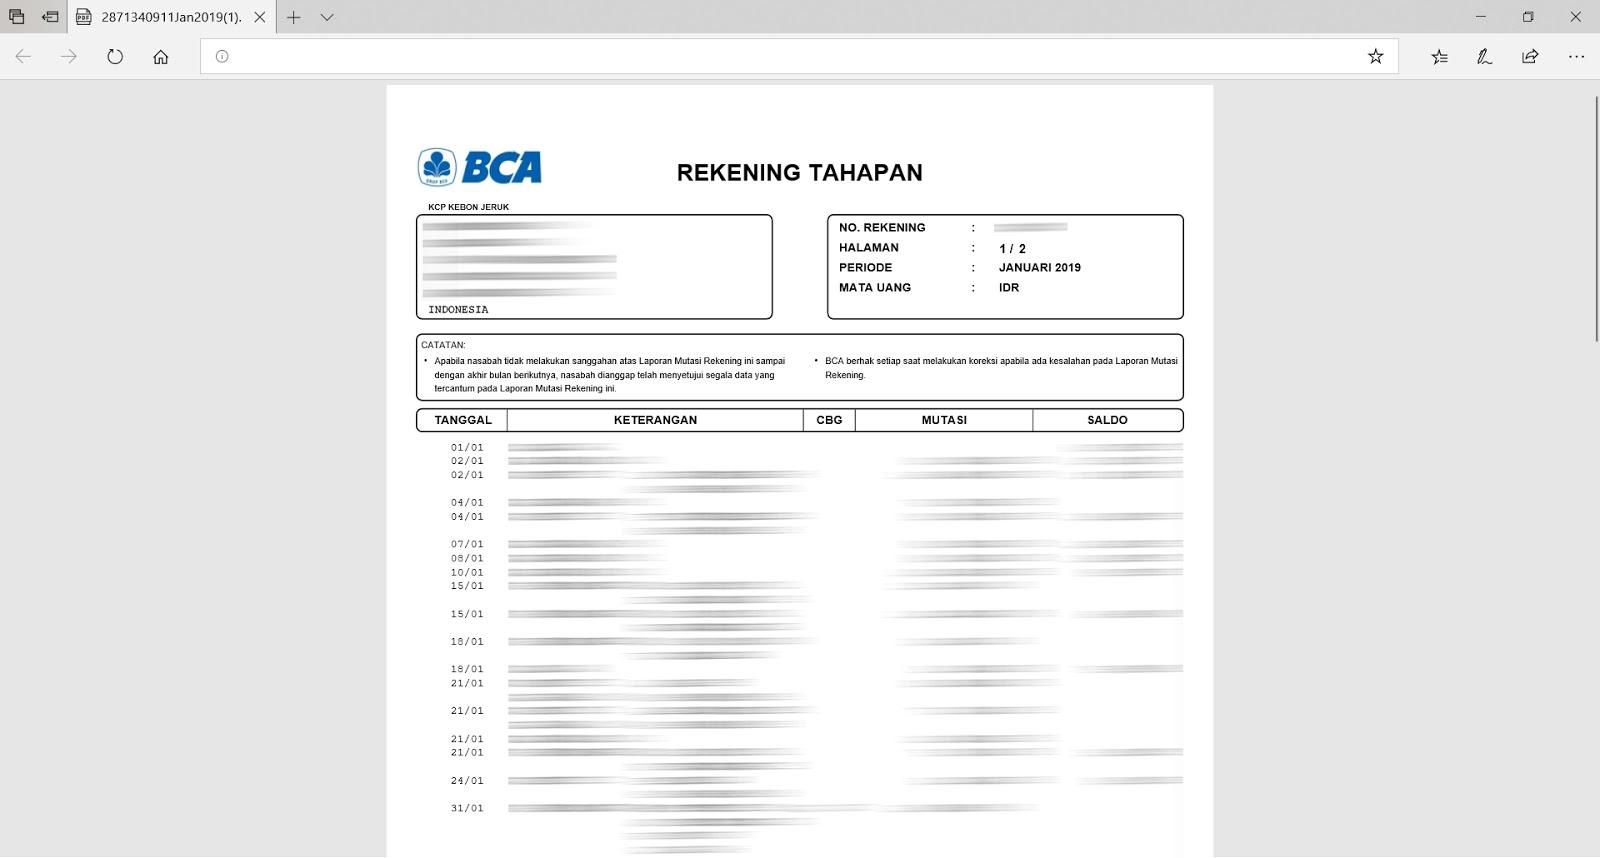 Sang Pelancong Cara Print Rekening Bca 3 Bulan Terakhir Tanpa Harus Ke Bank Bca